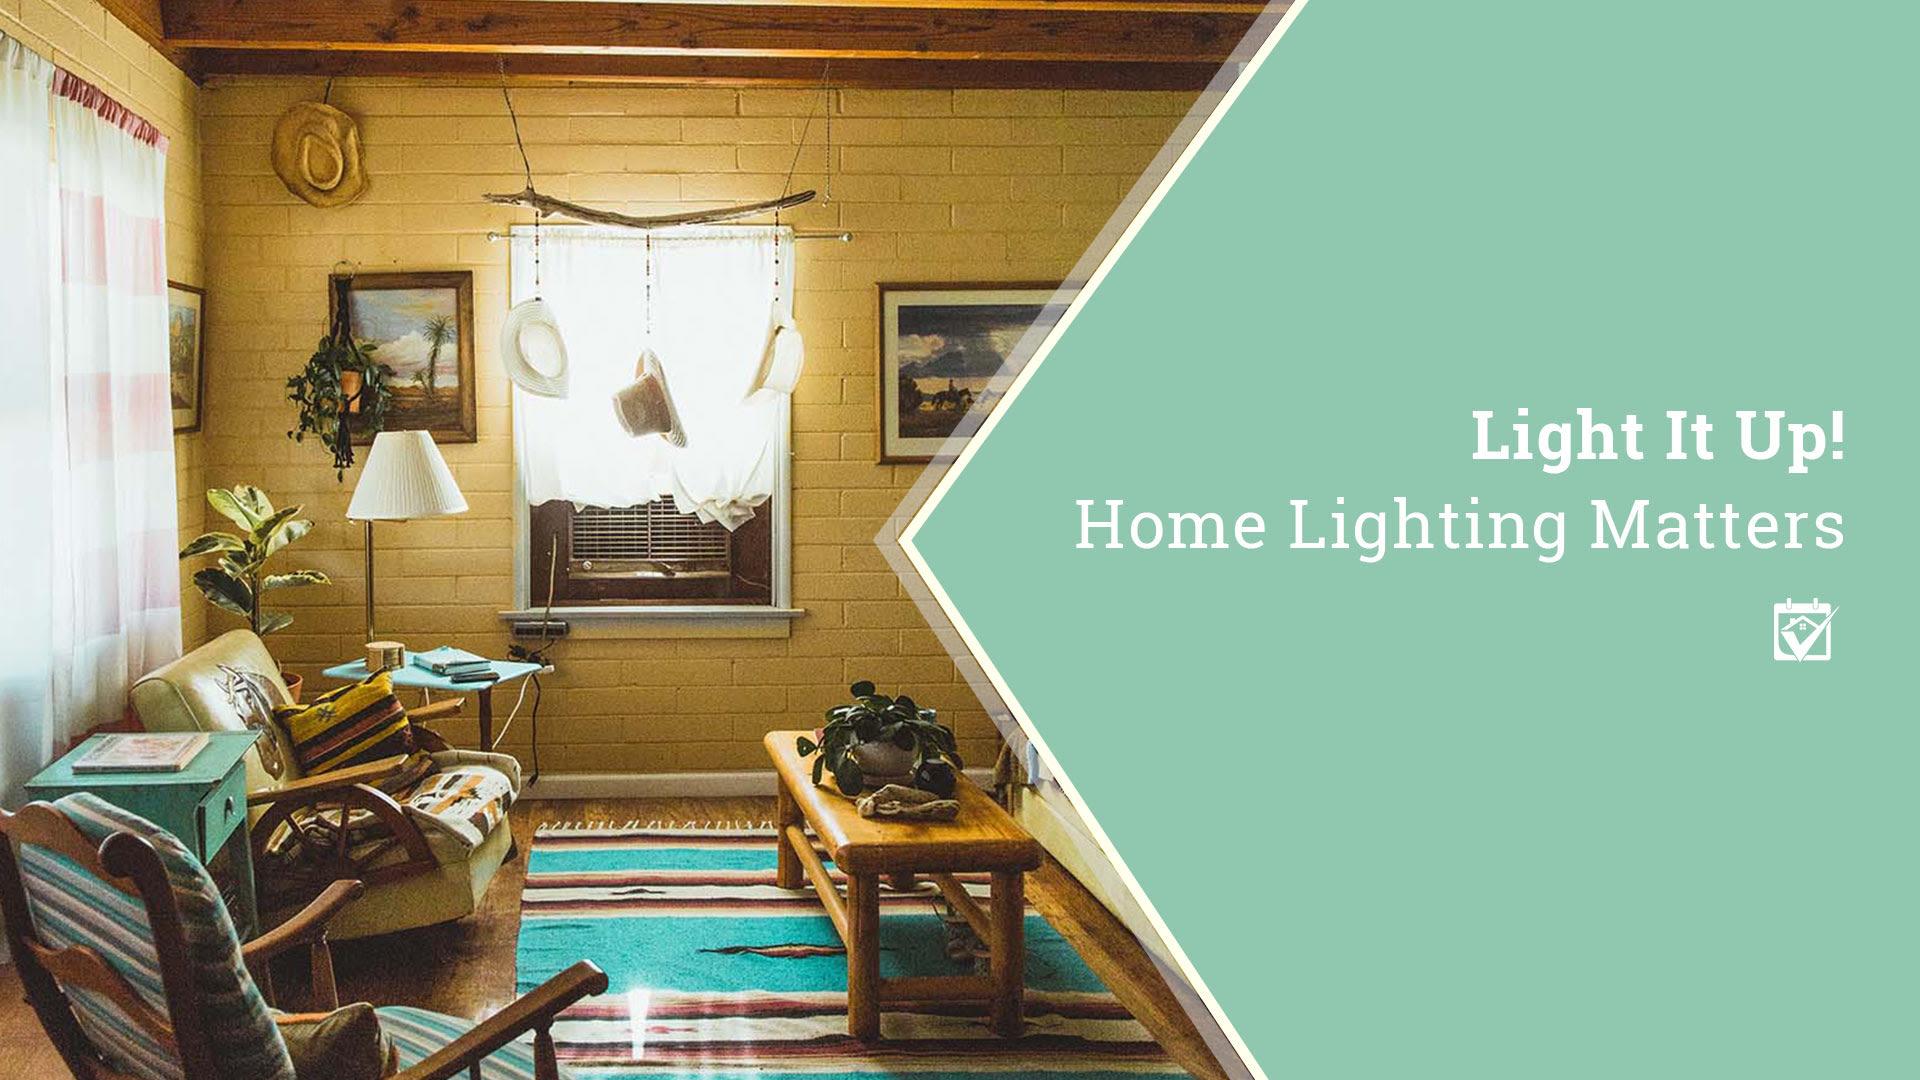 Home Lighting Matters